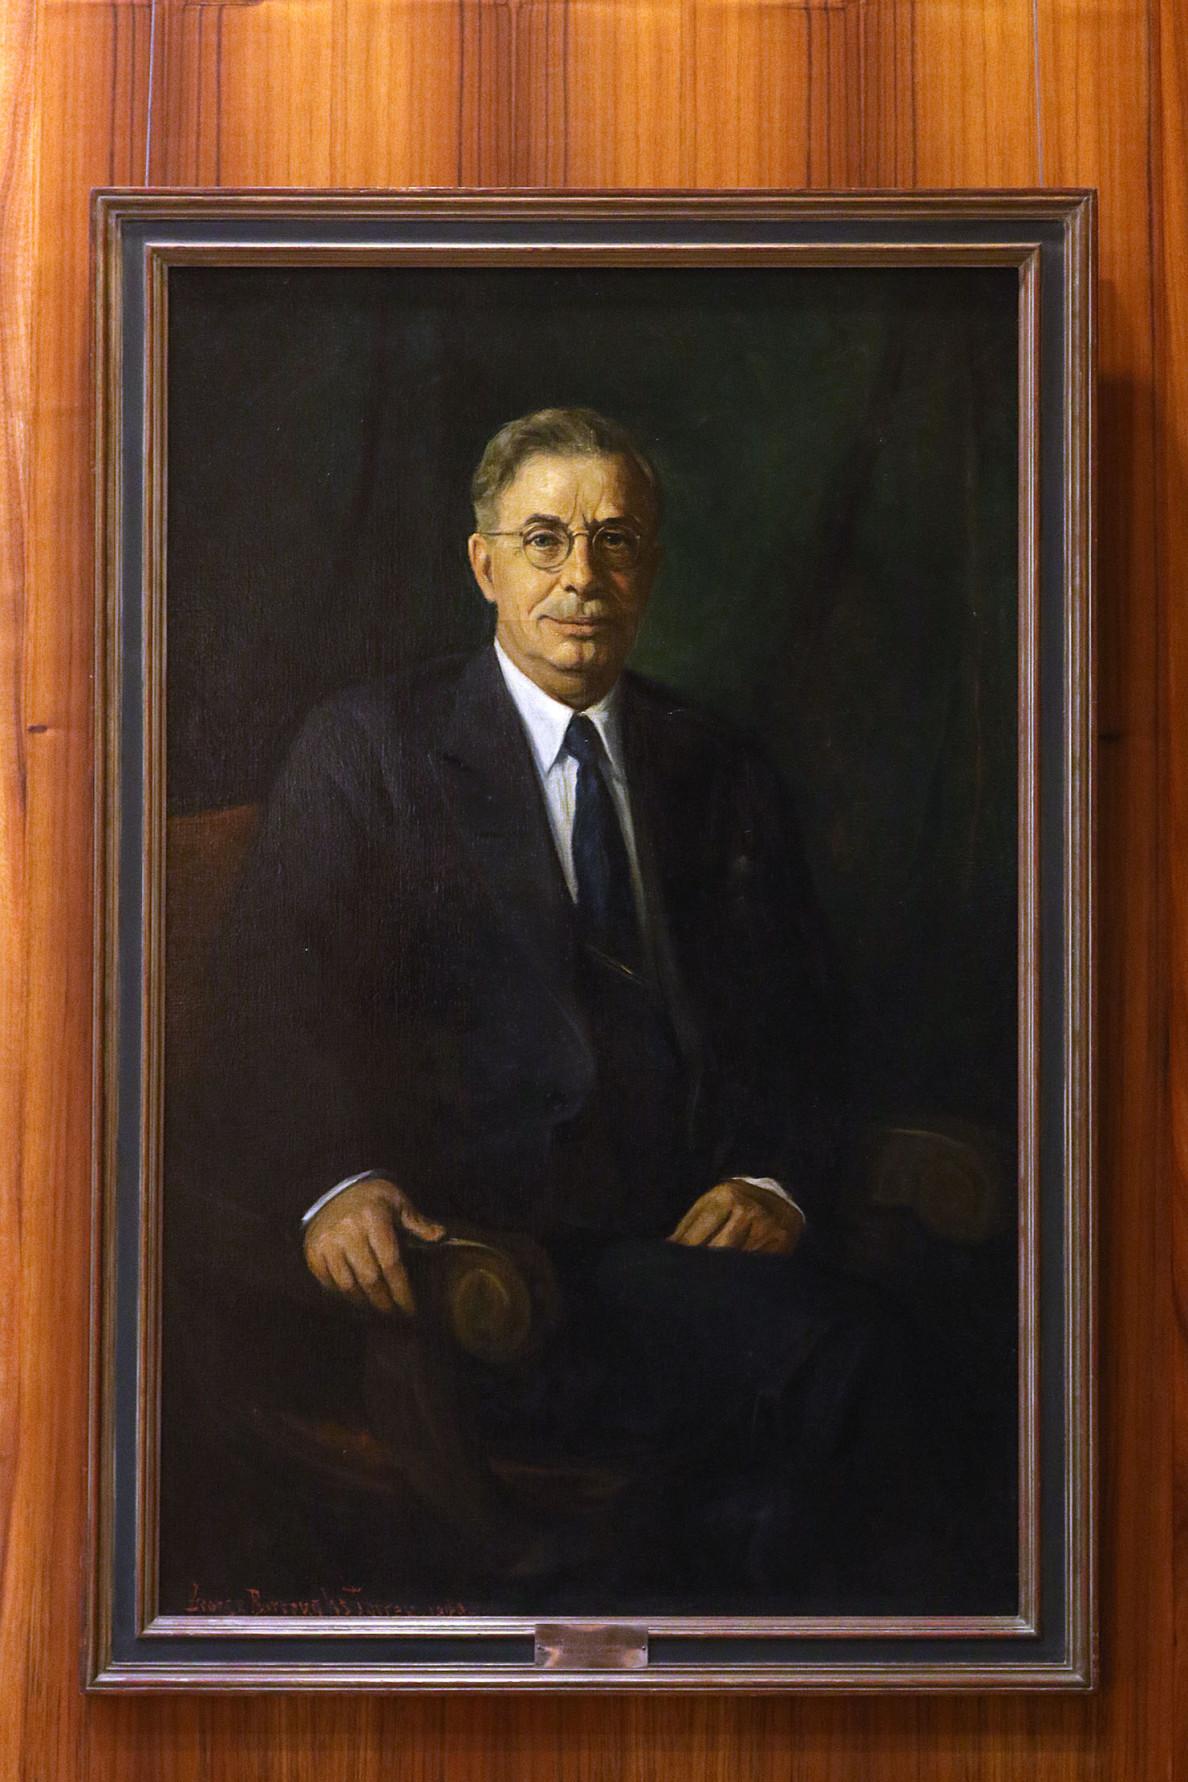 1934-1942